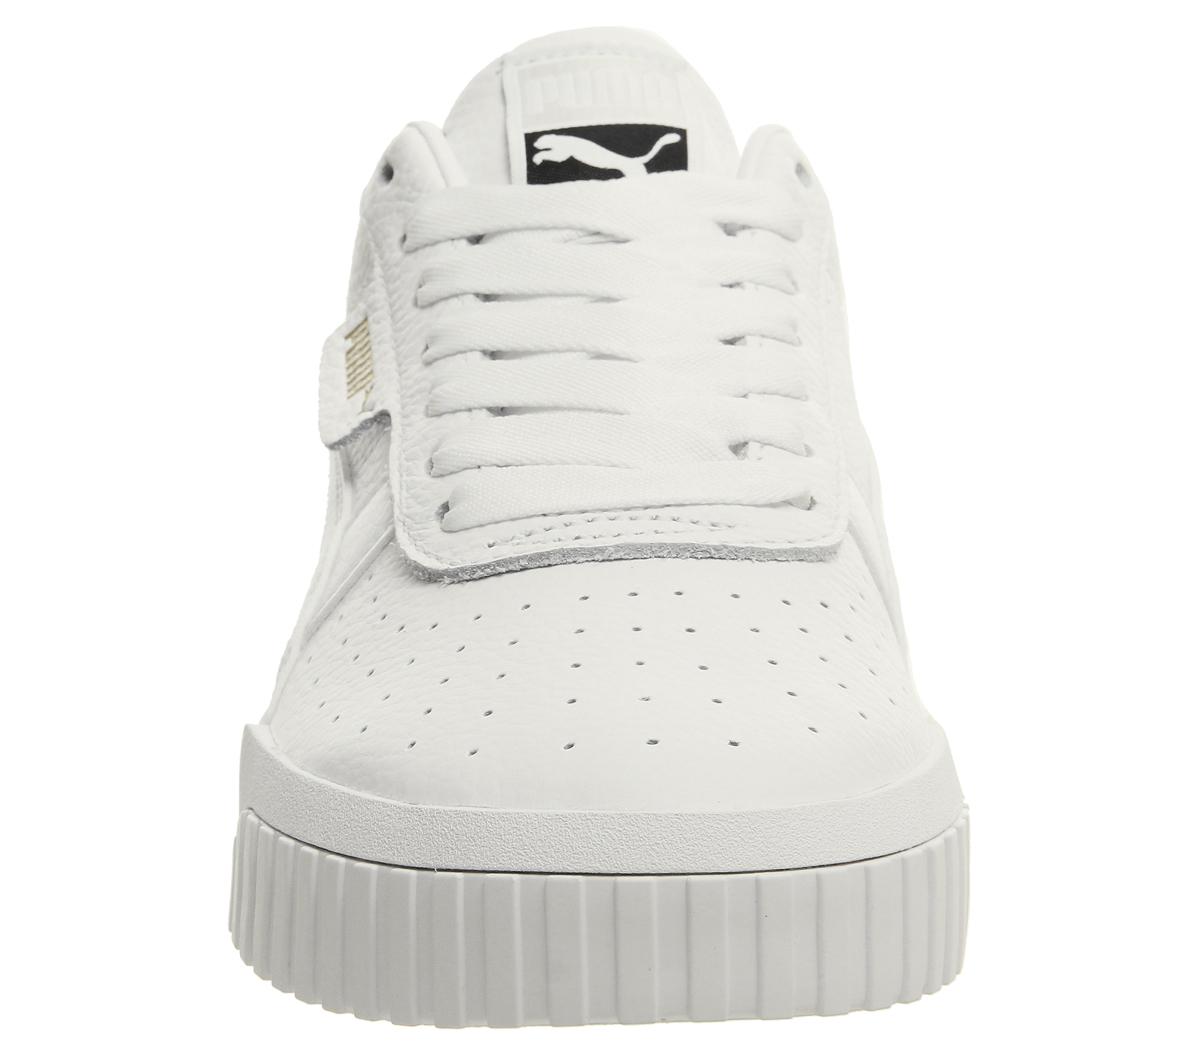 dfb5ad0643e Womens Puma Cali Trainers Puma White Puma White Trainers Shoes